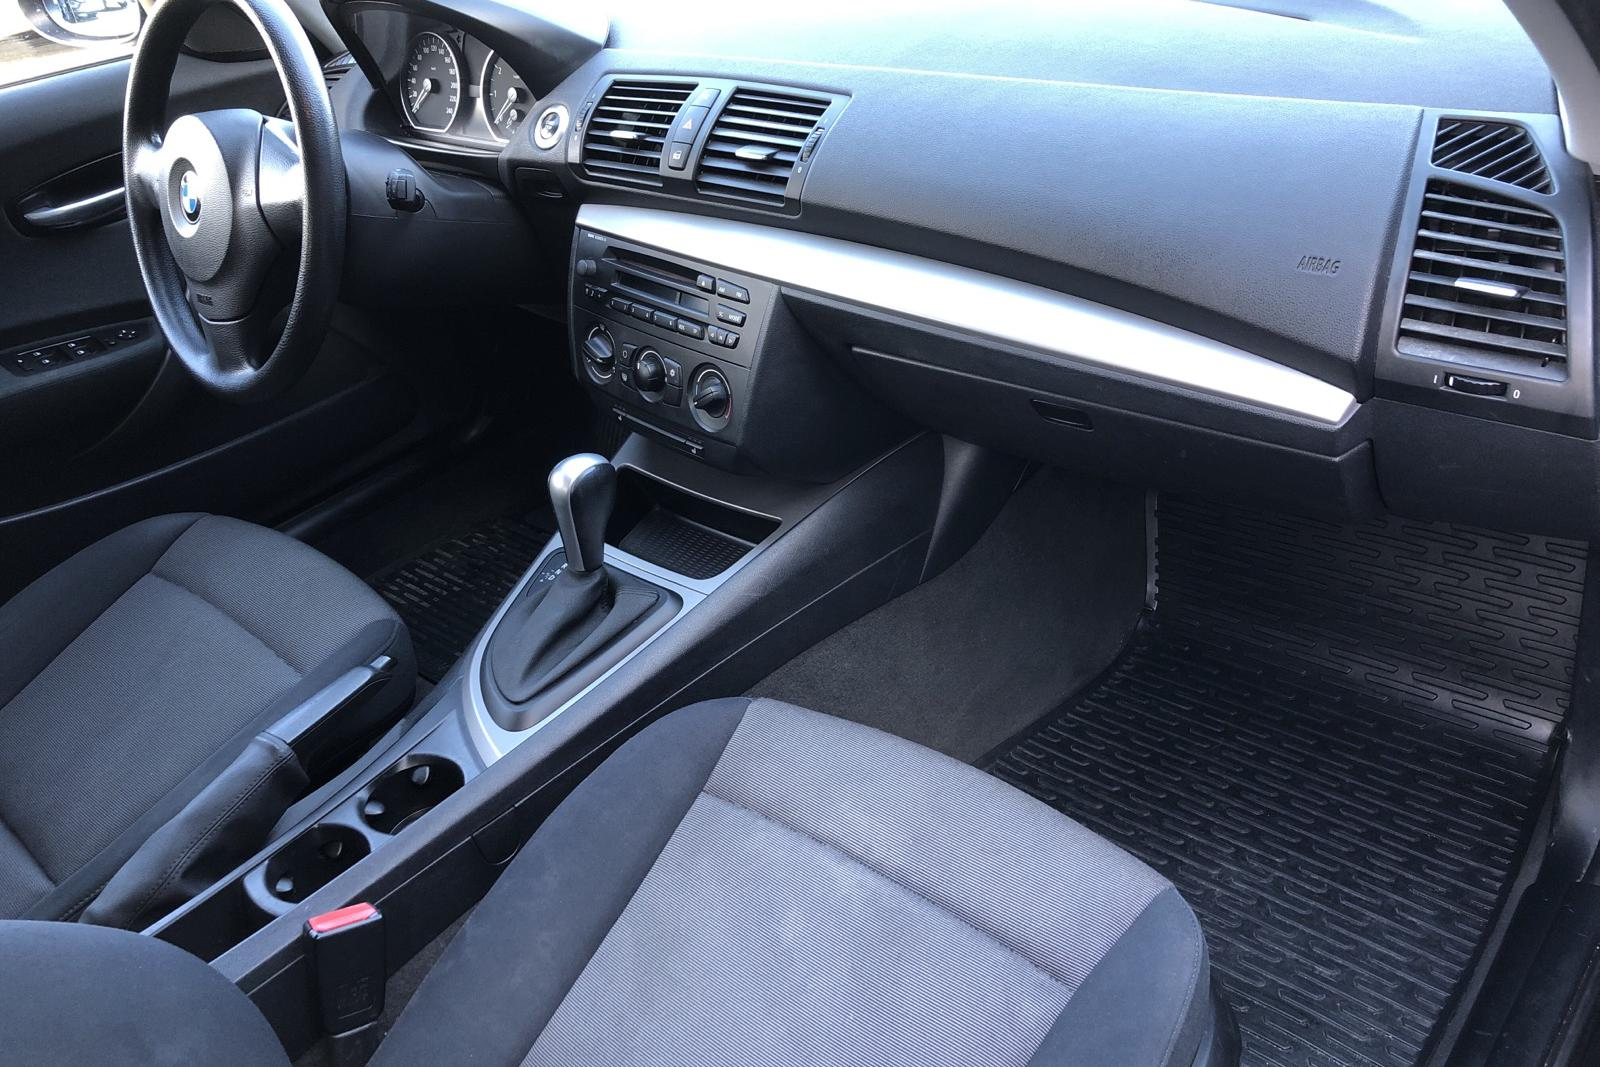 BMW 120i 5dr, E87 (150hk) - 11 853 mil - Automat - svart - 2006